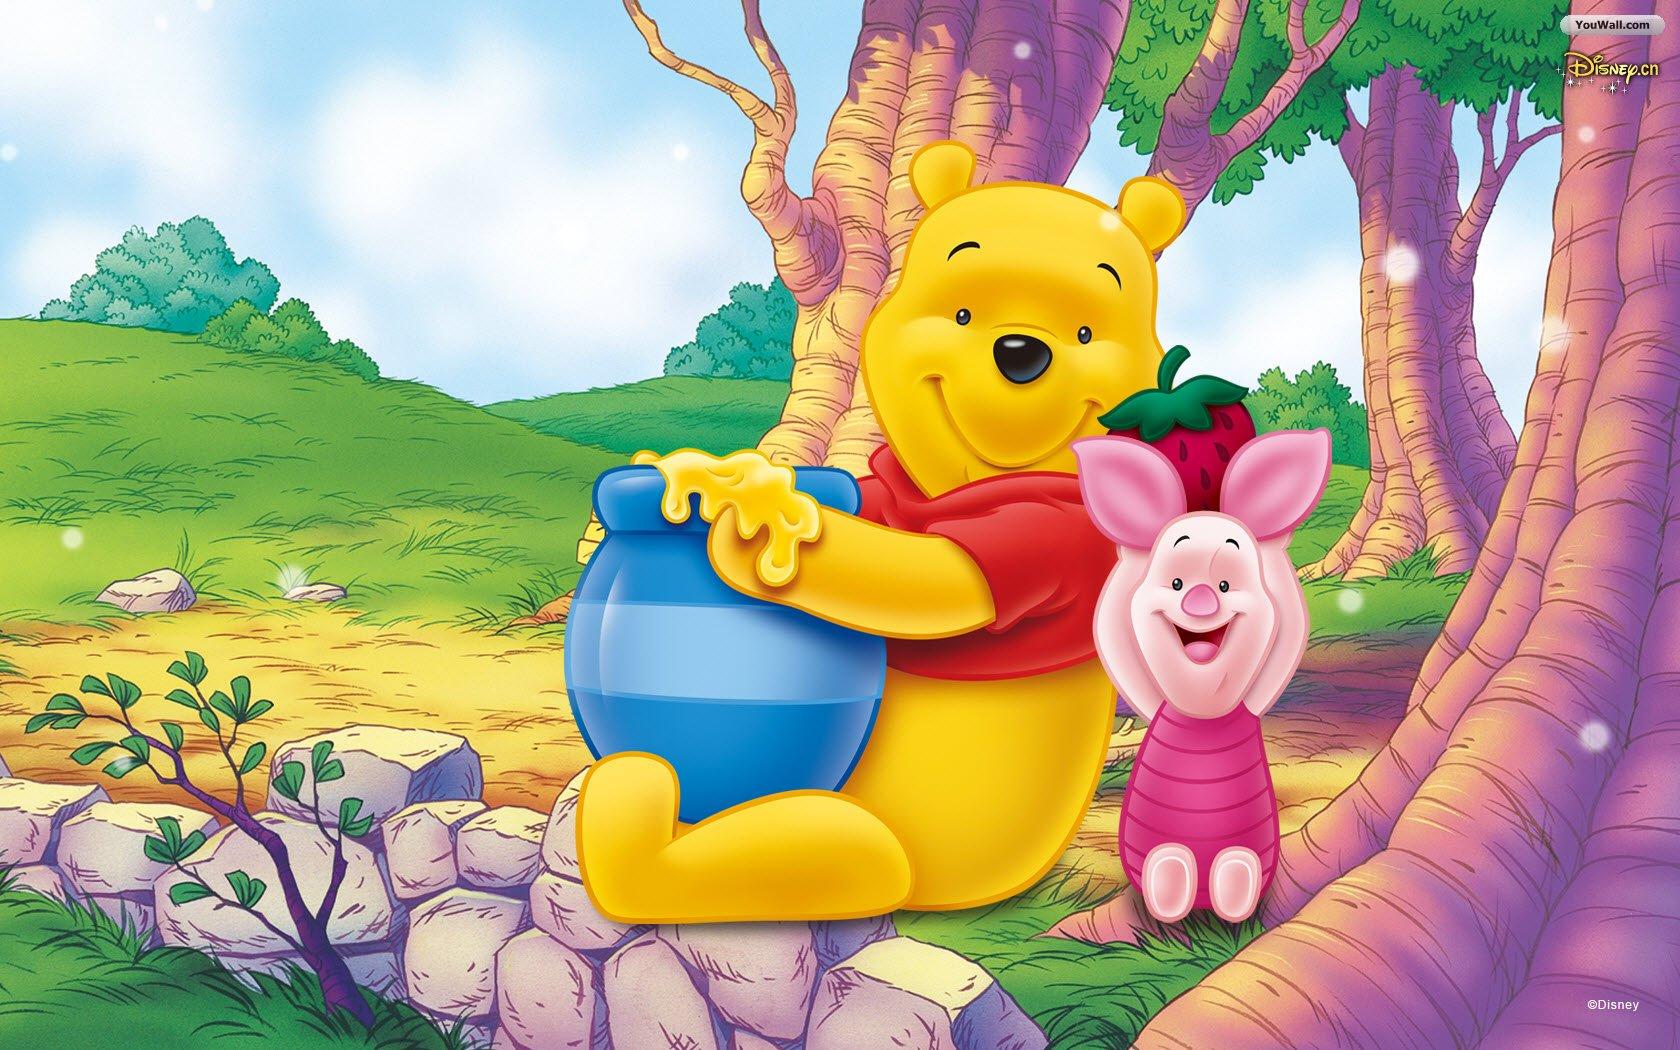 Gambar Kartun Lucu Keren: Gambar Kartun Winnie The Pooh Lucu